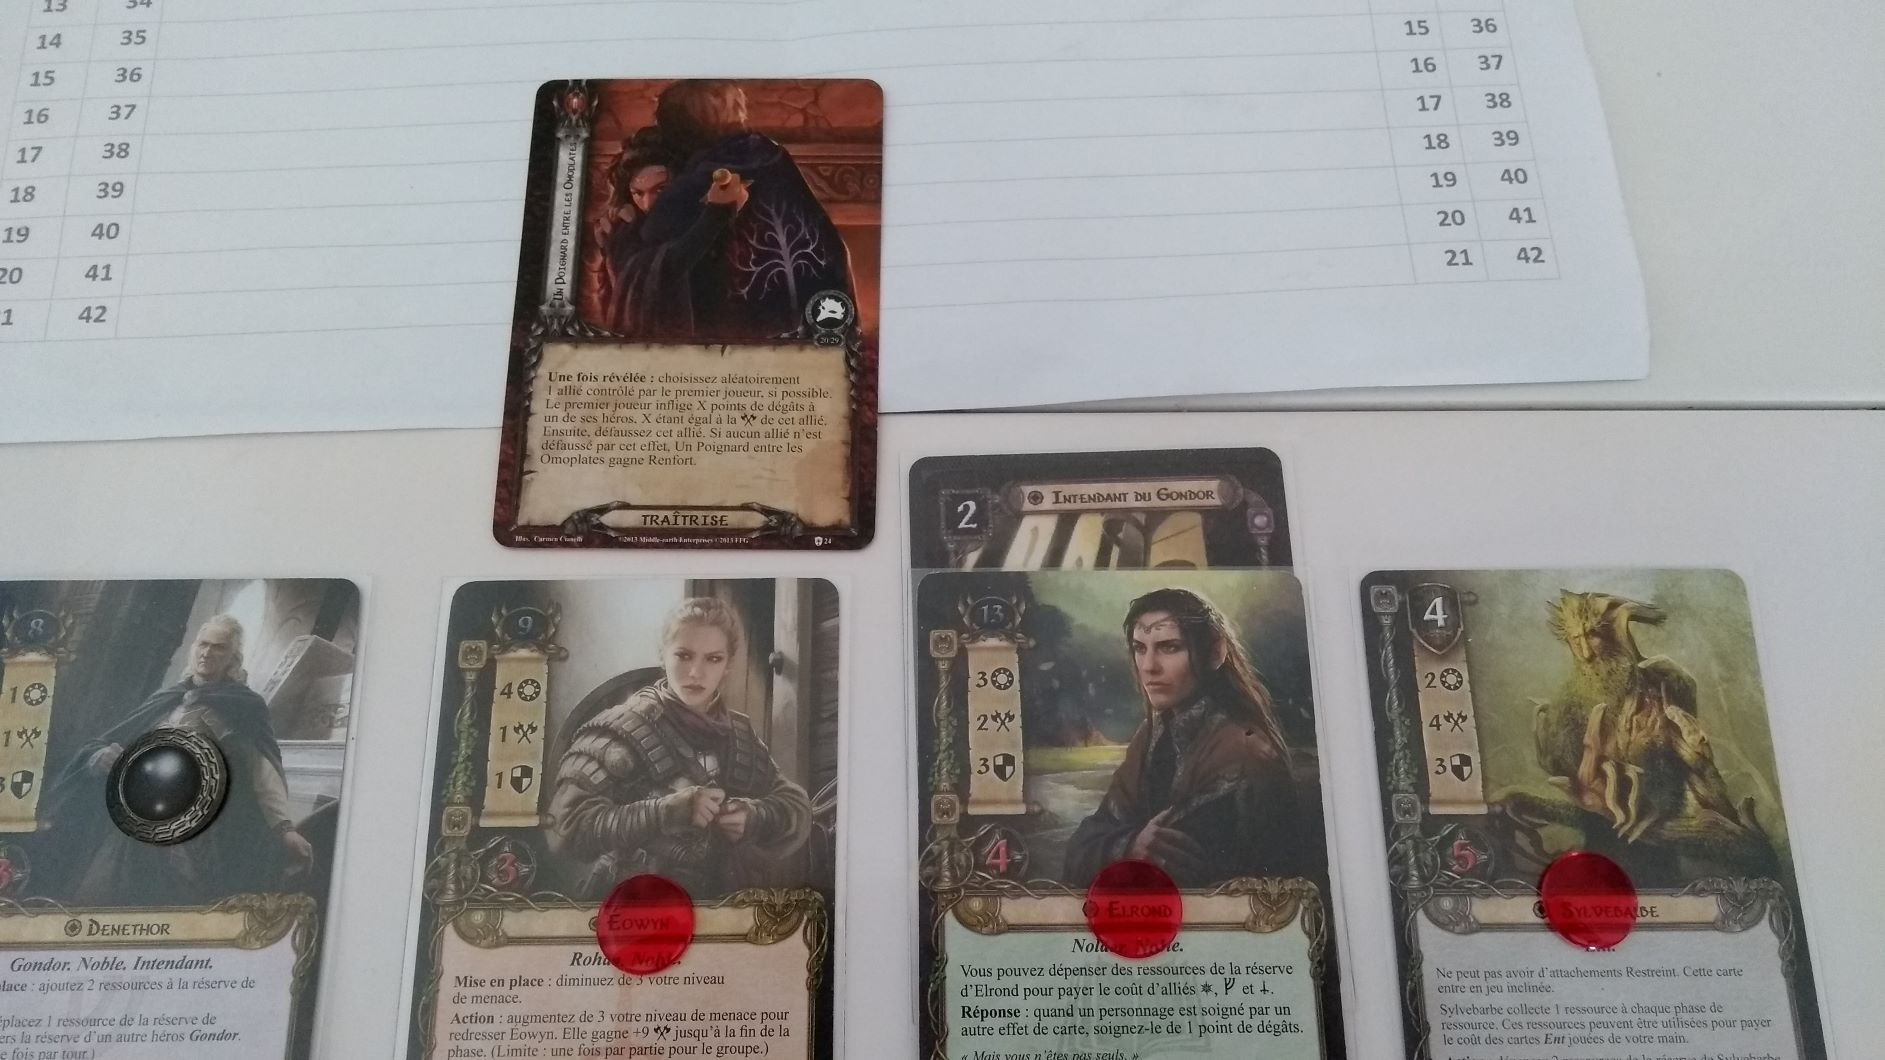 [Ent !] Eowyn II/Elrond/Denethor II - Page 3 Img1